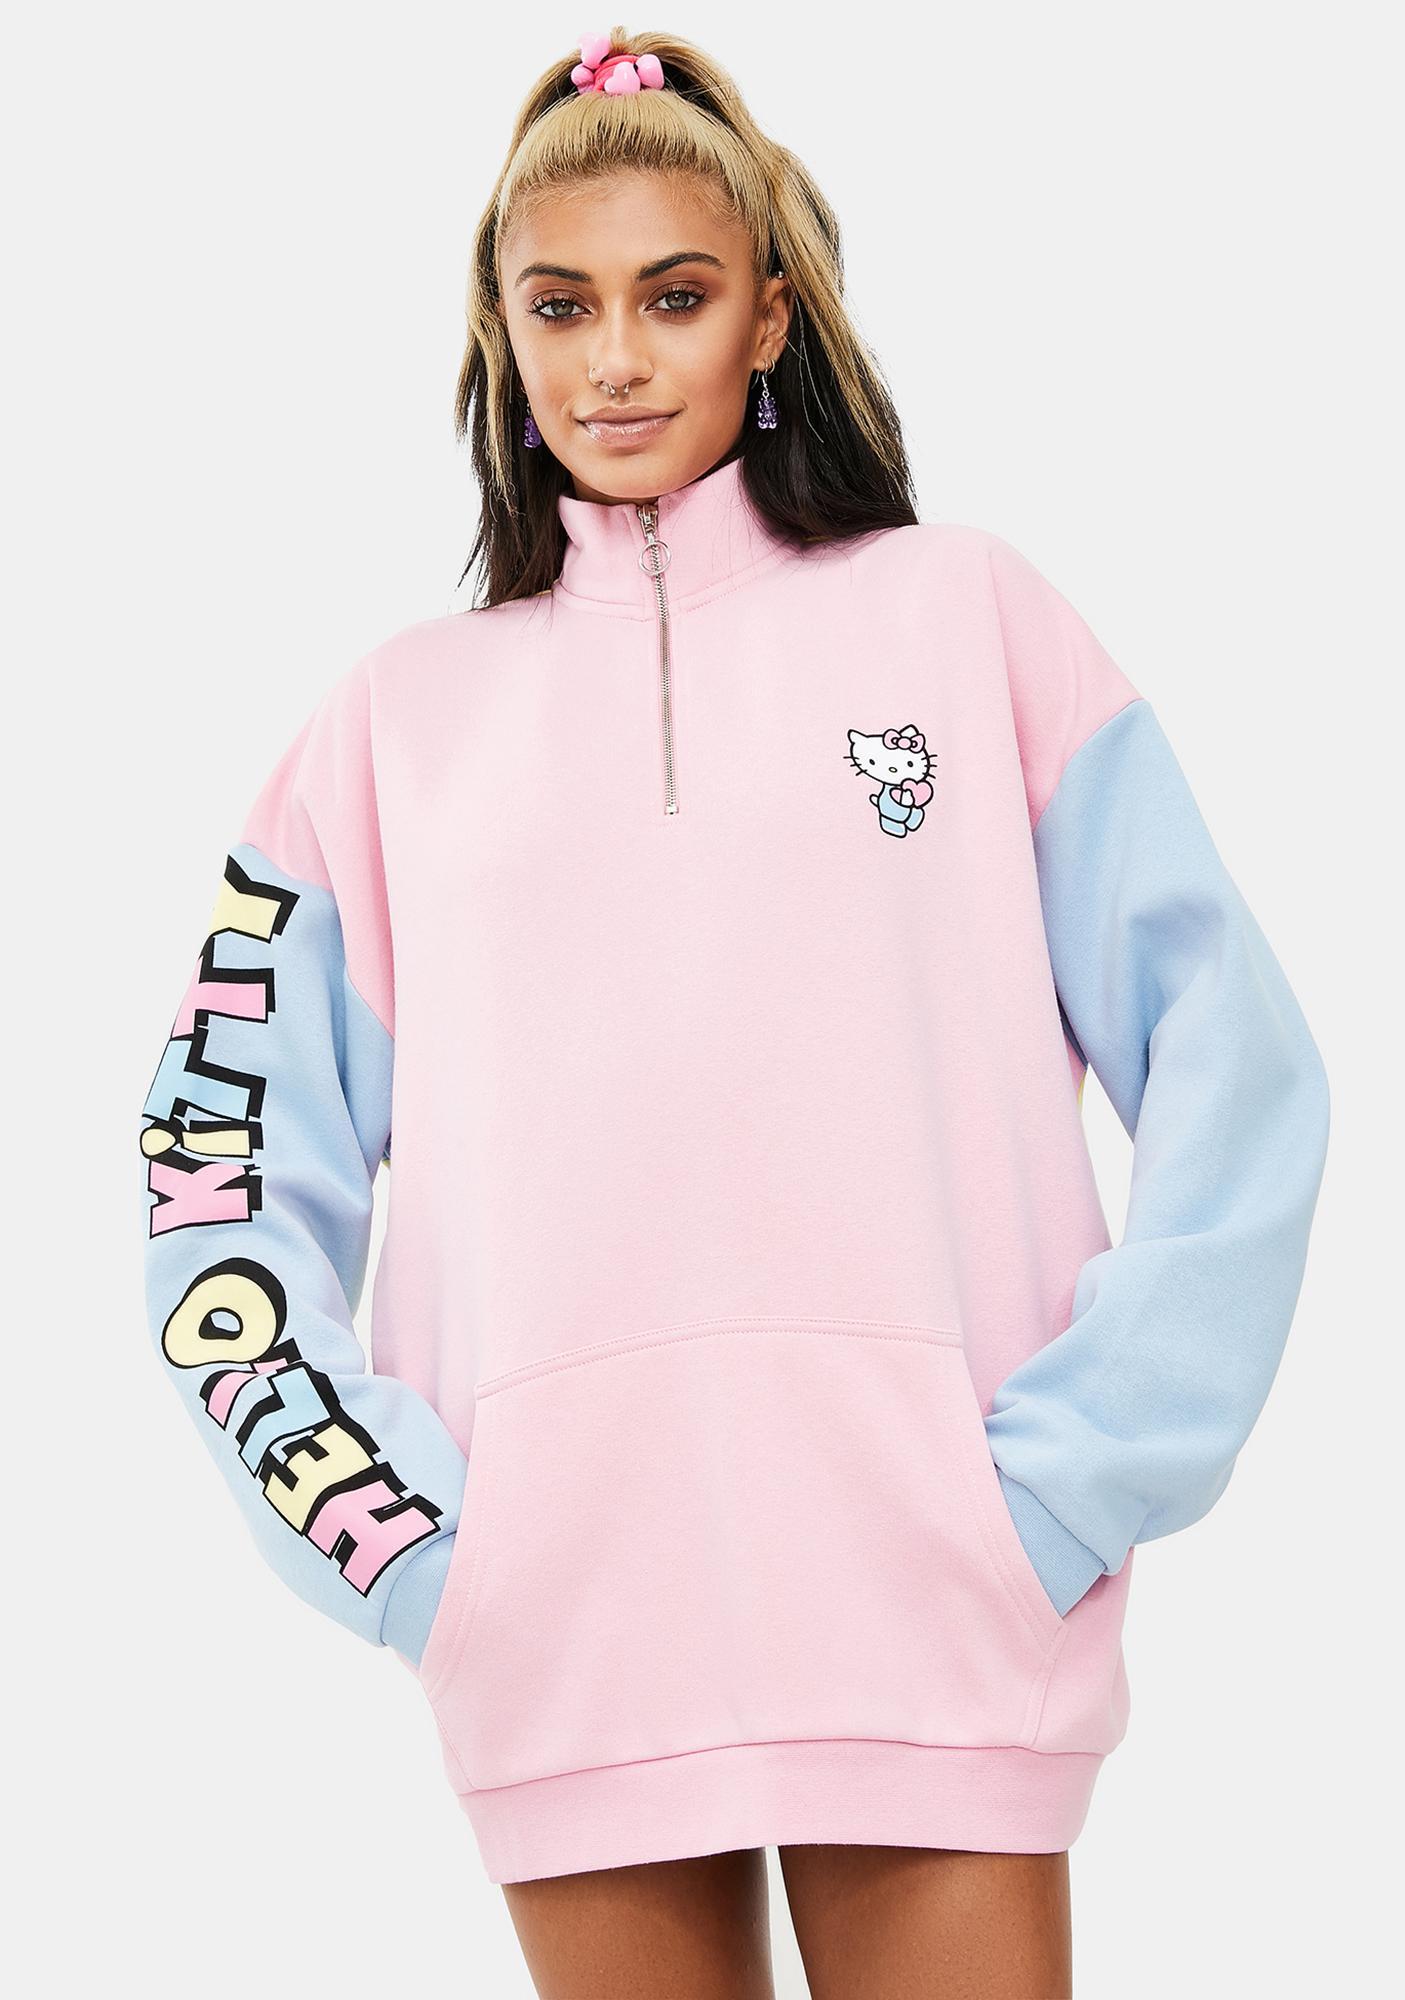 NEW GIRL ORDER Hello Kitty Color Contrast Panel Sweatshirt